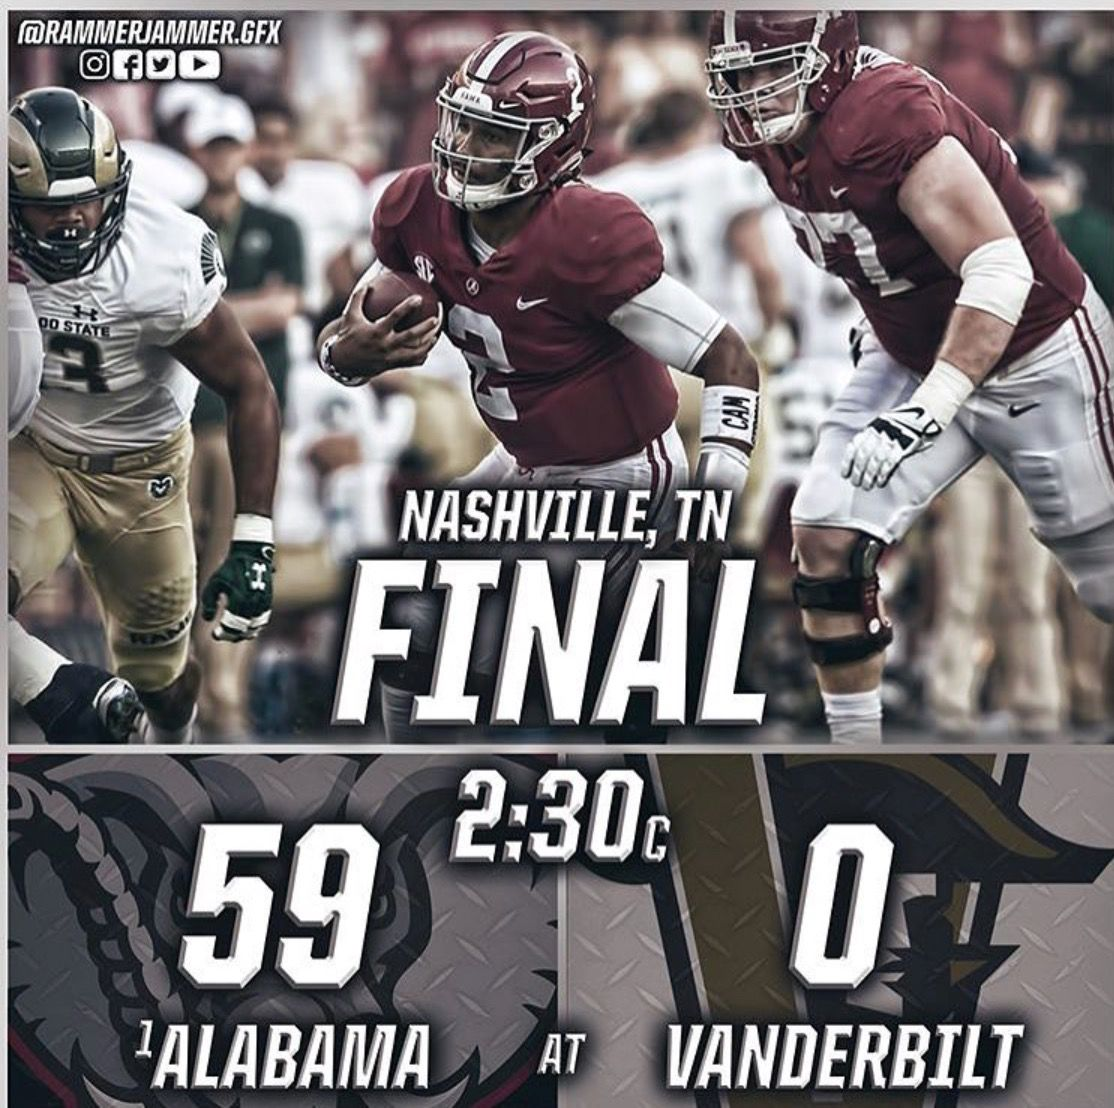 Alabama 59 Vandy 0 Graphic by rammer jammer.gfx Total Domination ...